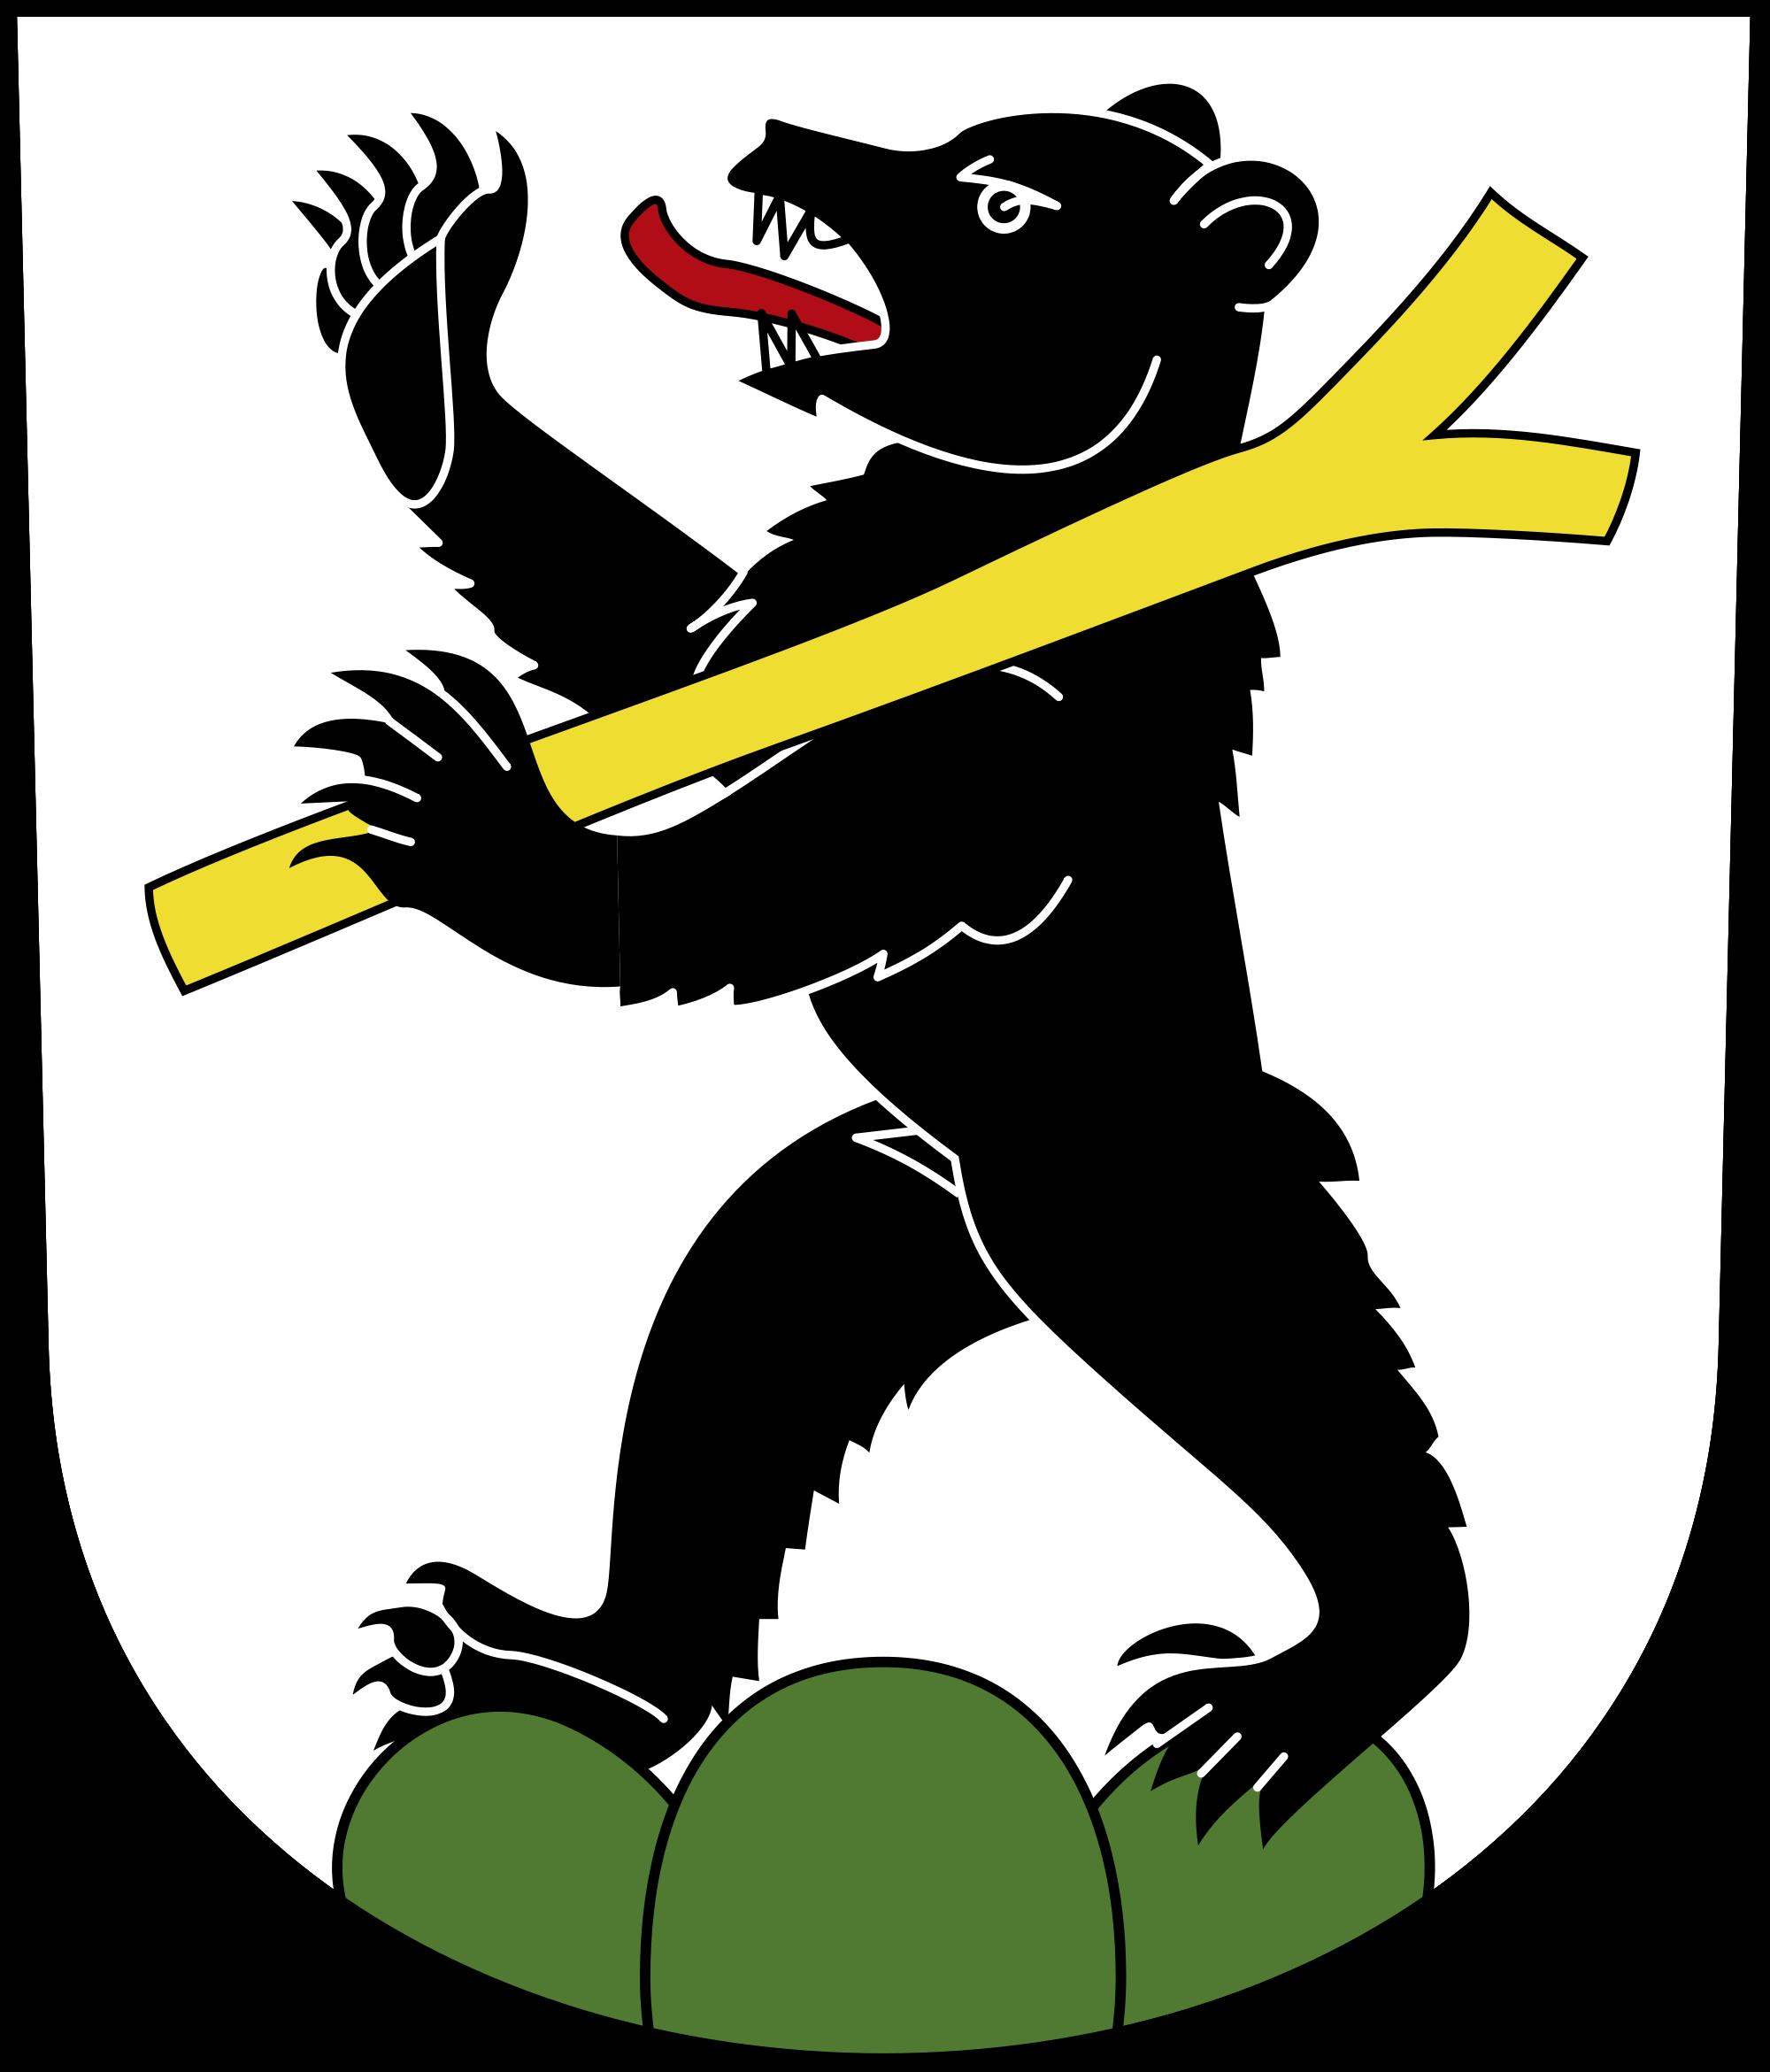 Datei:Dielsdorf.